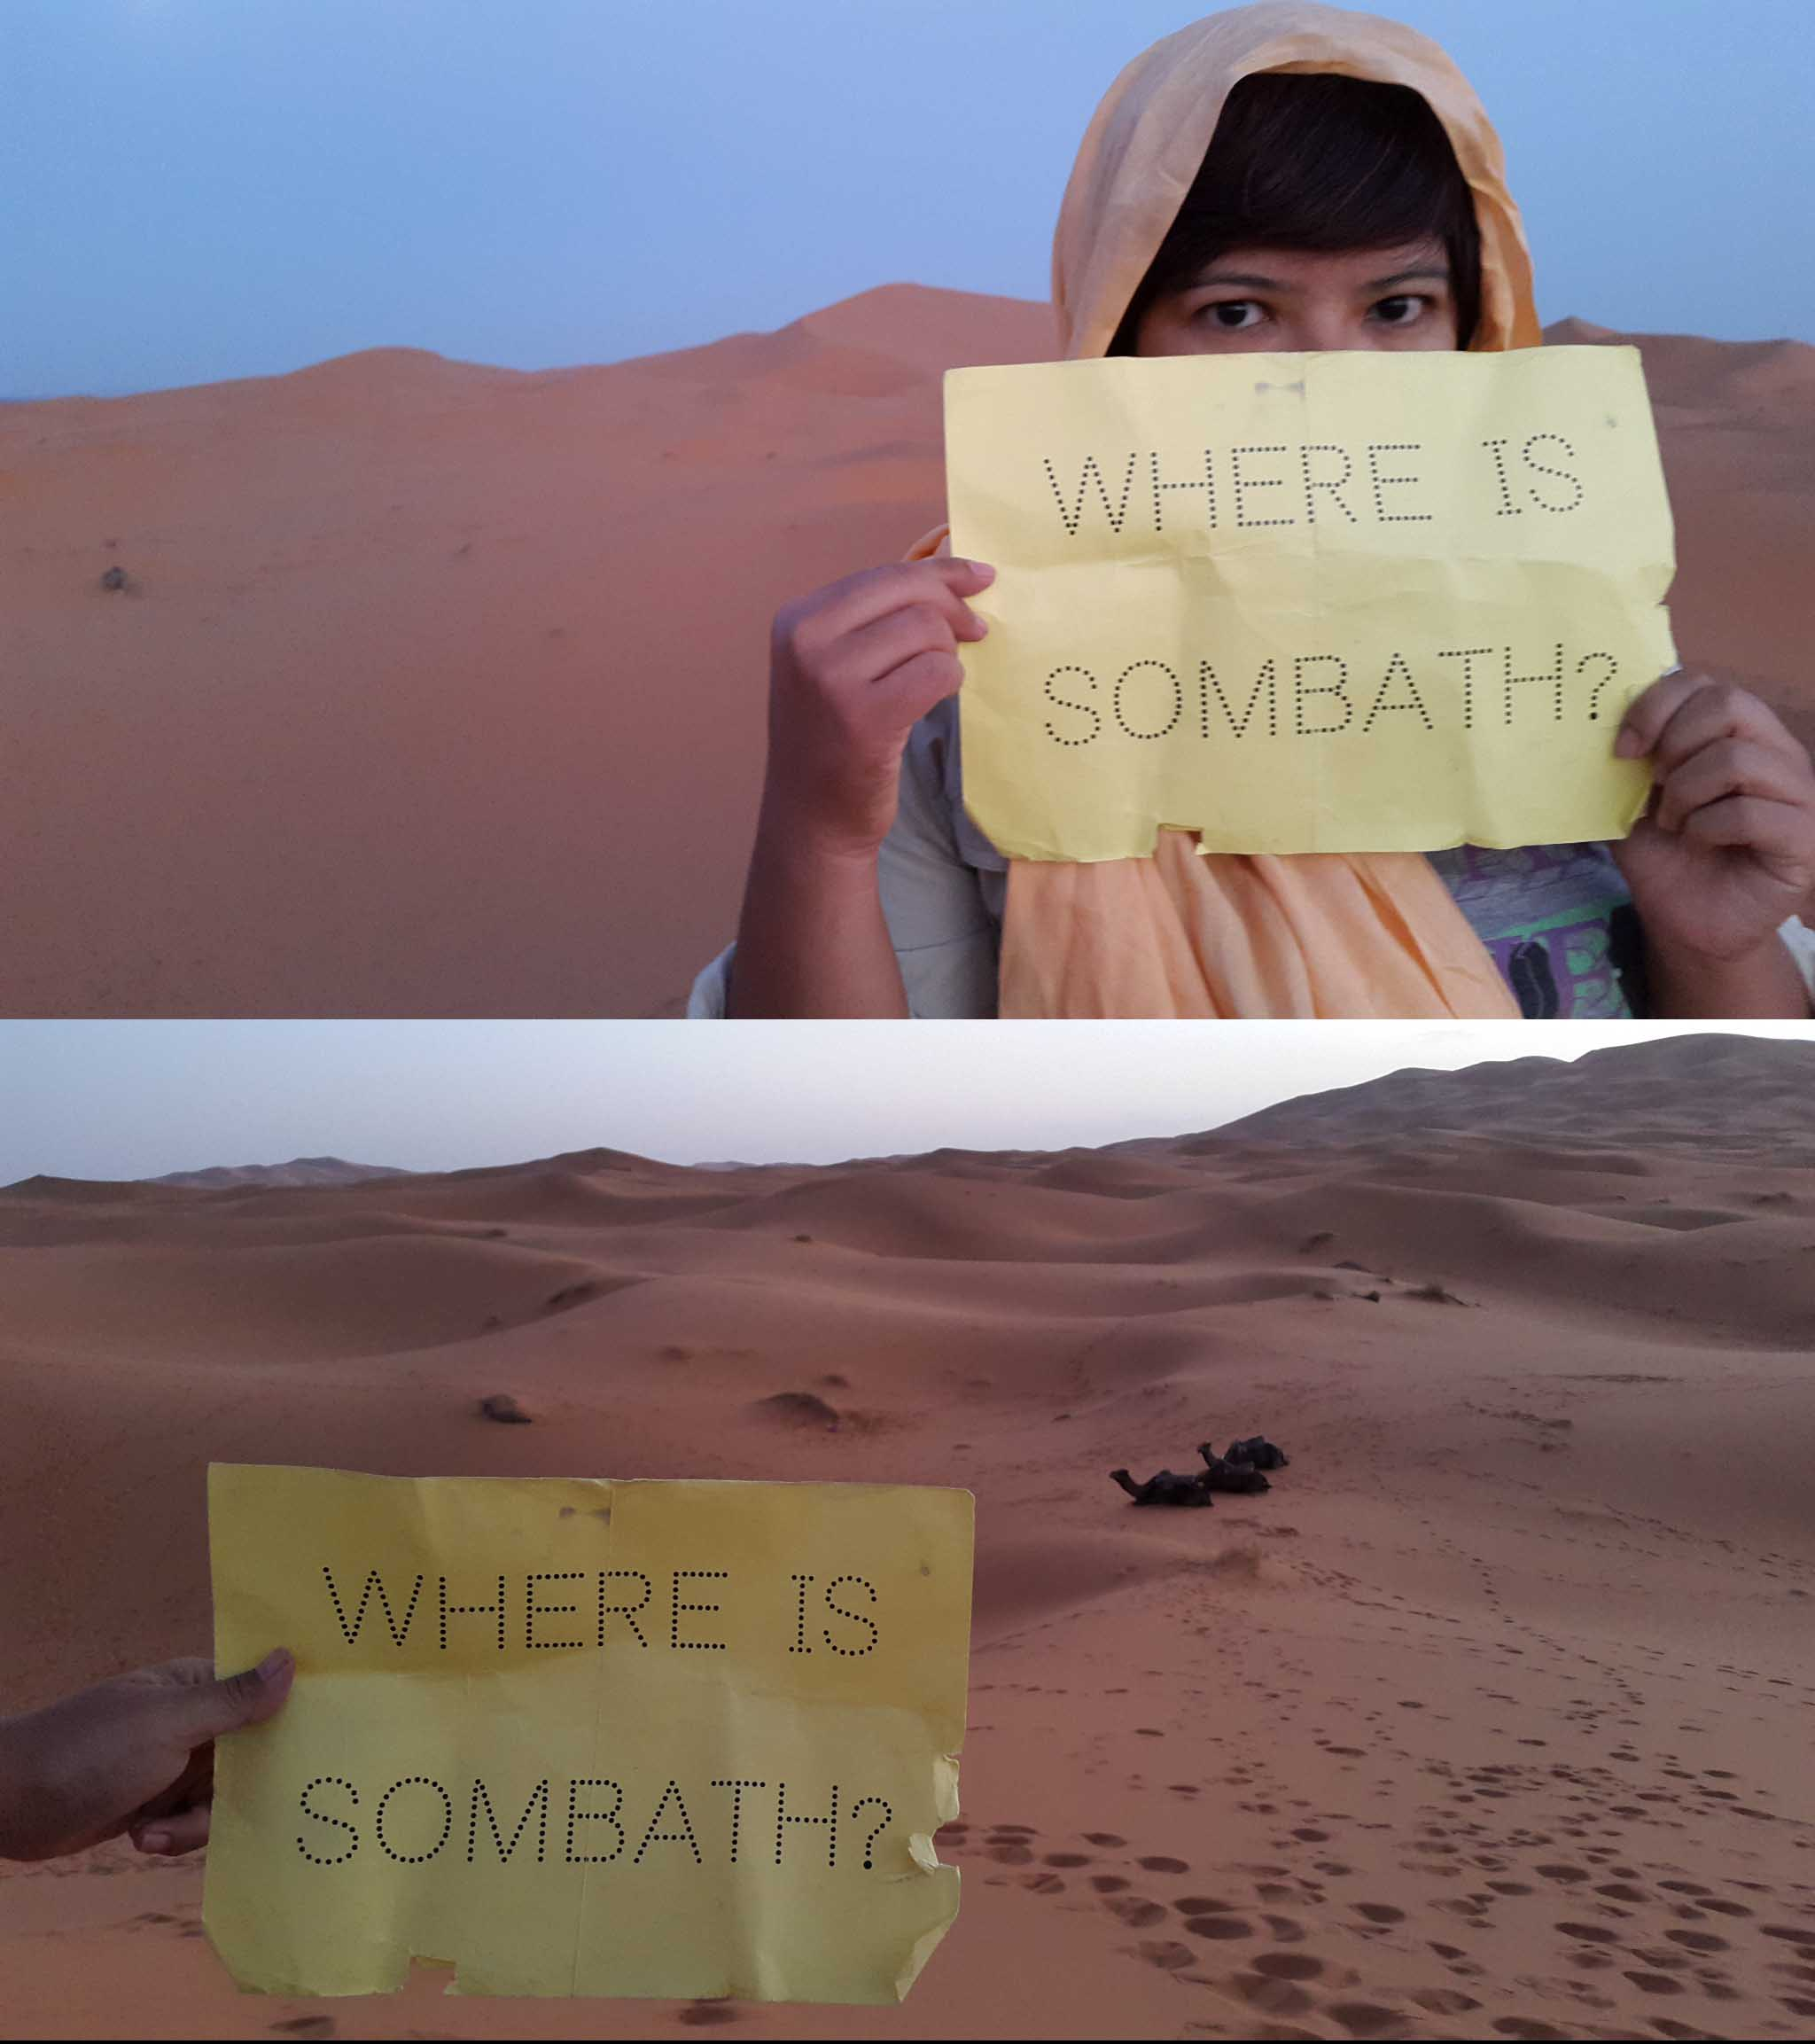 Morocco-Sahara Desert-2015